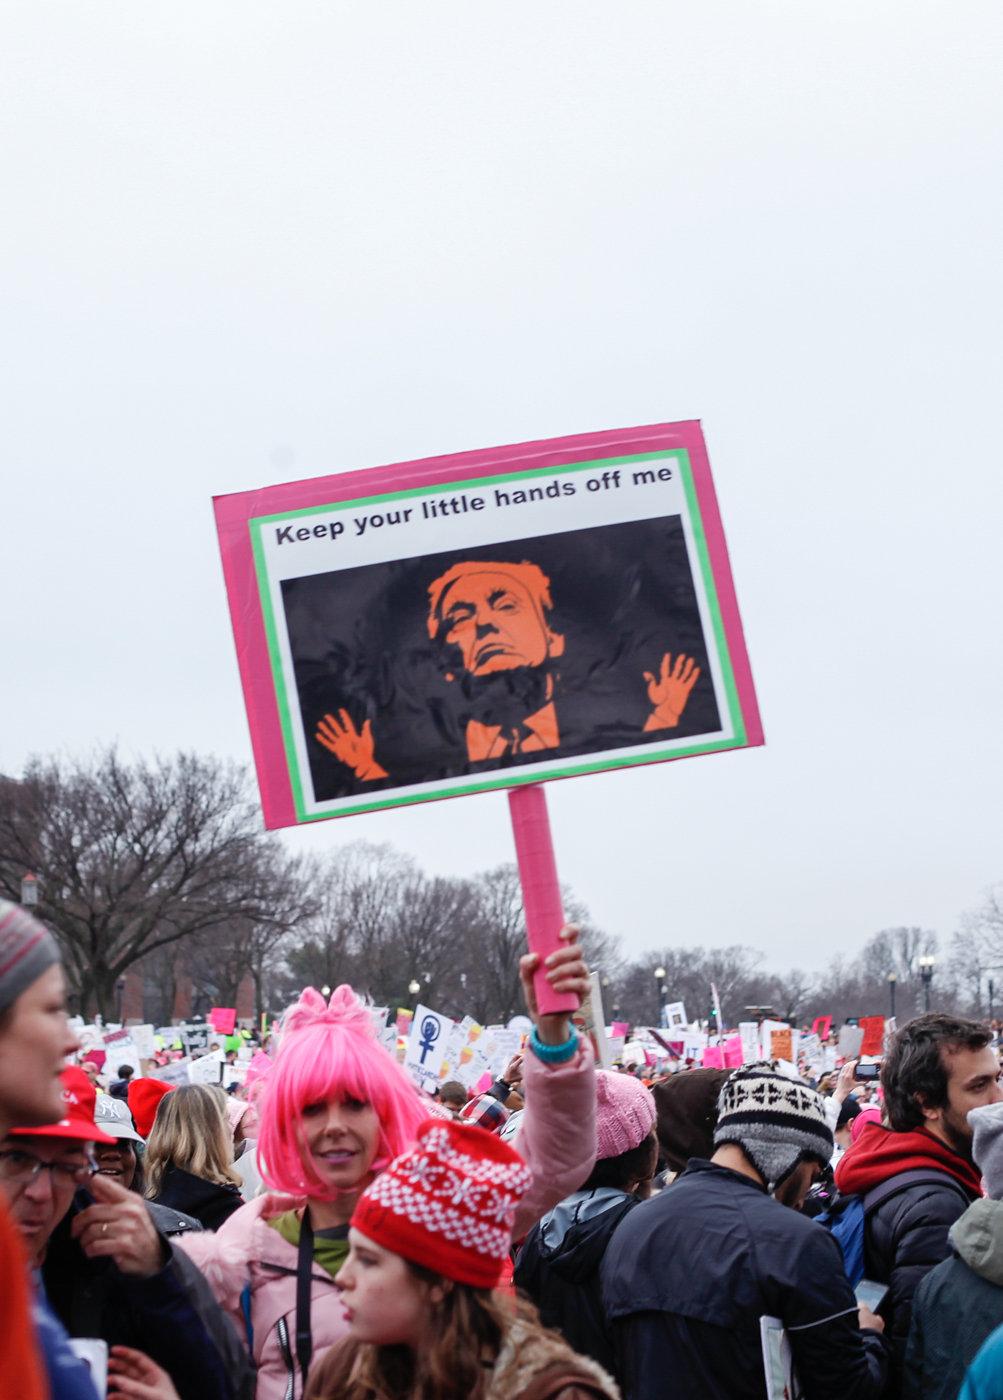 Women's March on Washington Zig Metzler - Keep Your Little Hands Off Me